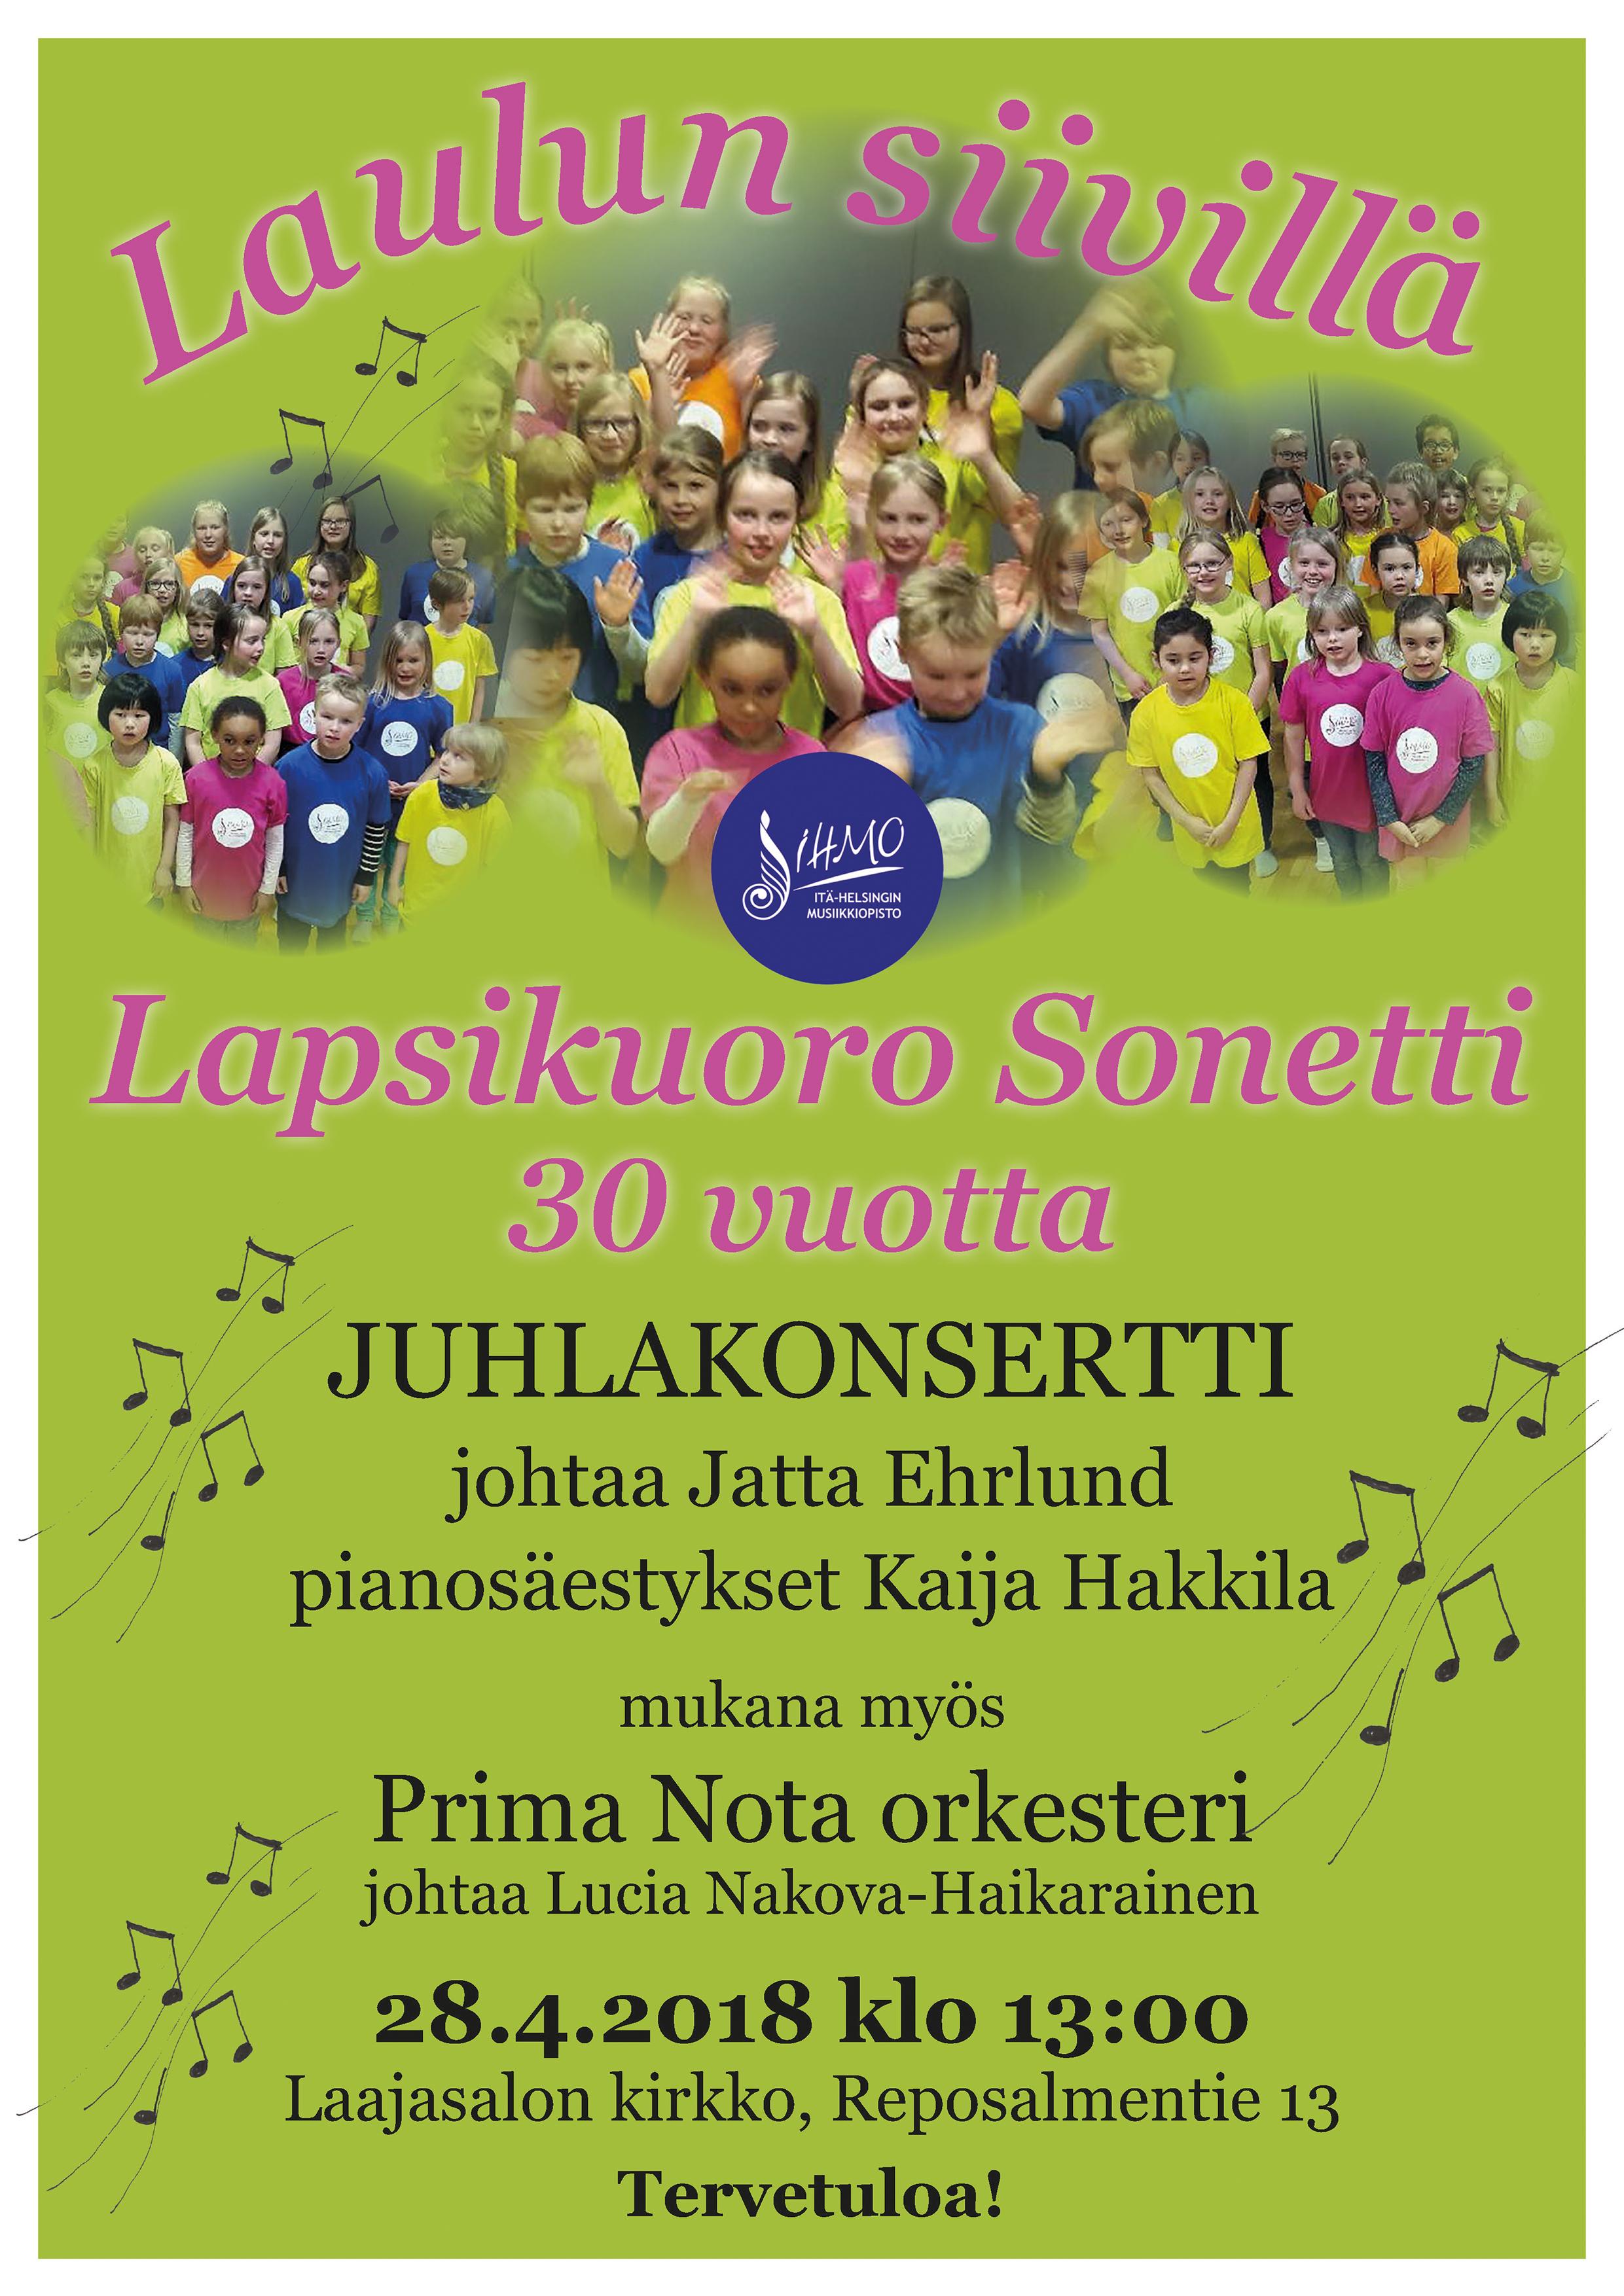 1051258867-LapsikuoroSonetti_30v.jpg